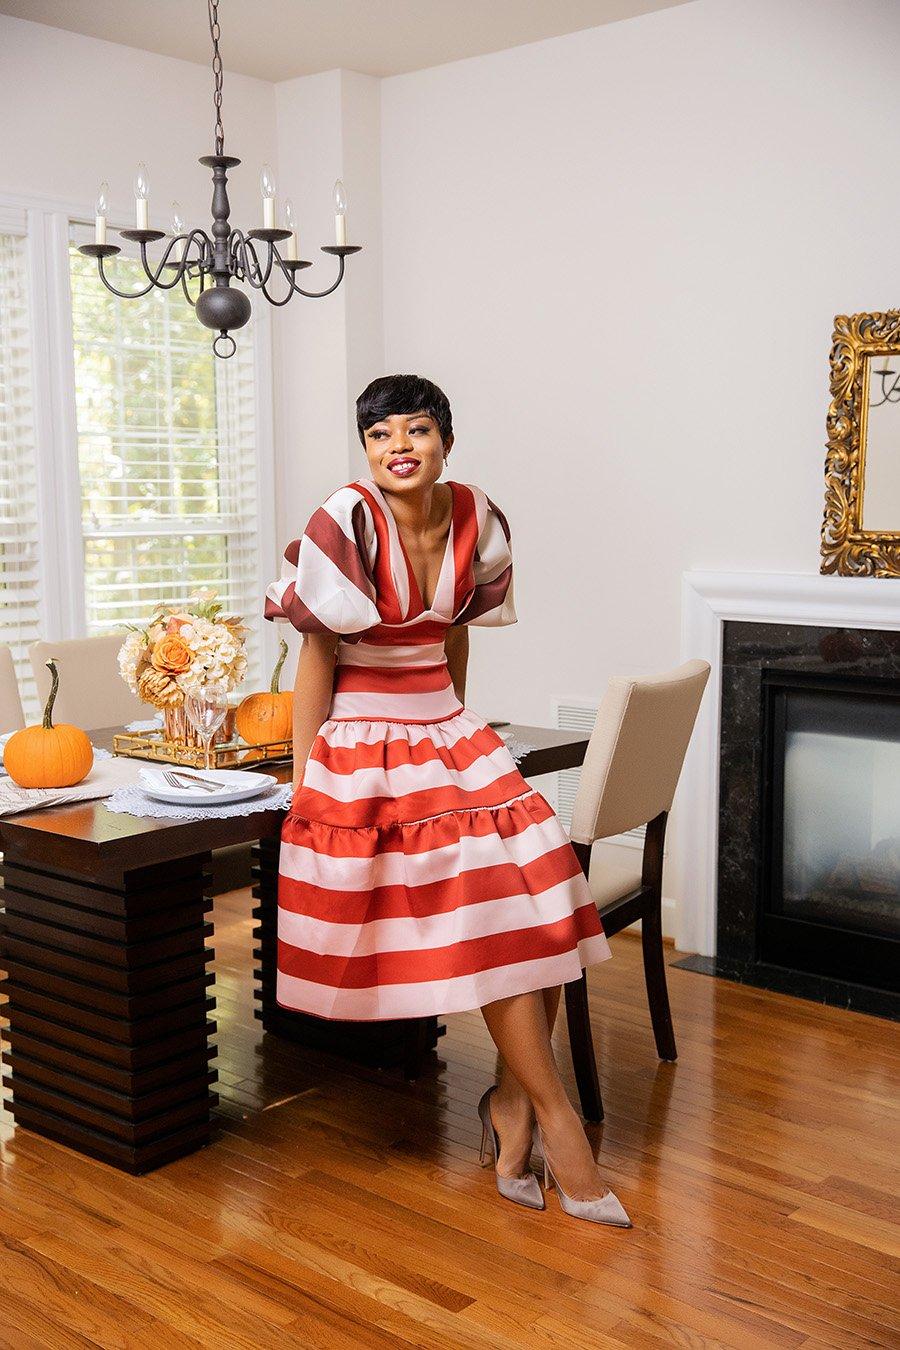 stella-adewunmi-of-jadore-fashion-blog-shares-what-to-wear-thankgiving-day-asos-dress